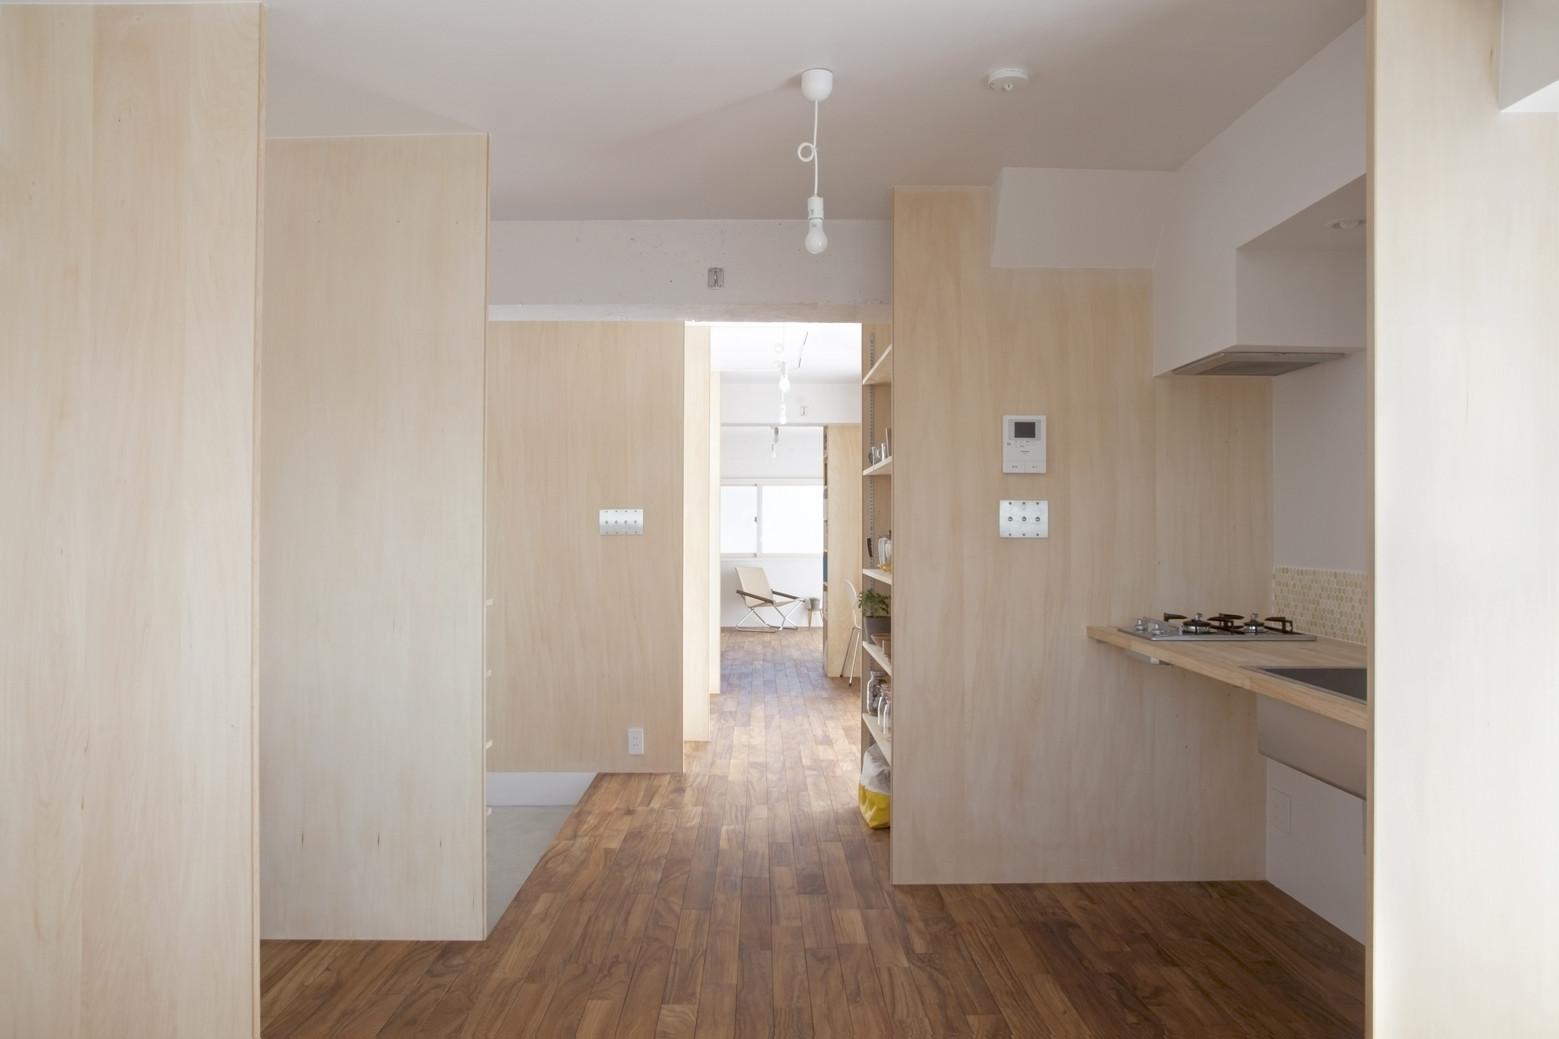 Wing Wall House / Camp Design Inc + Sumosaga Fudosan, © Masumi Kawamura